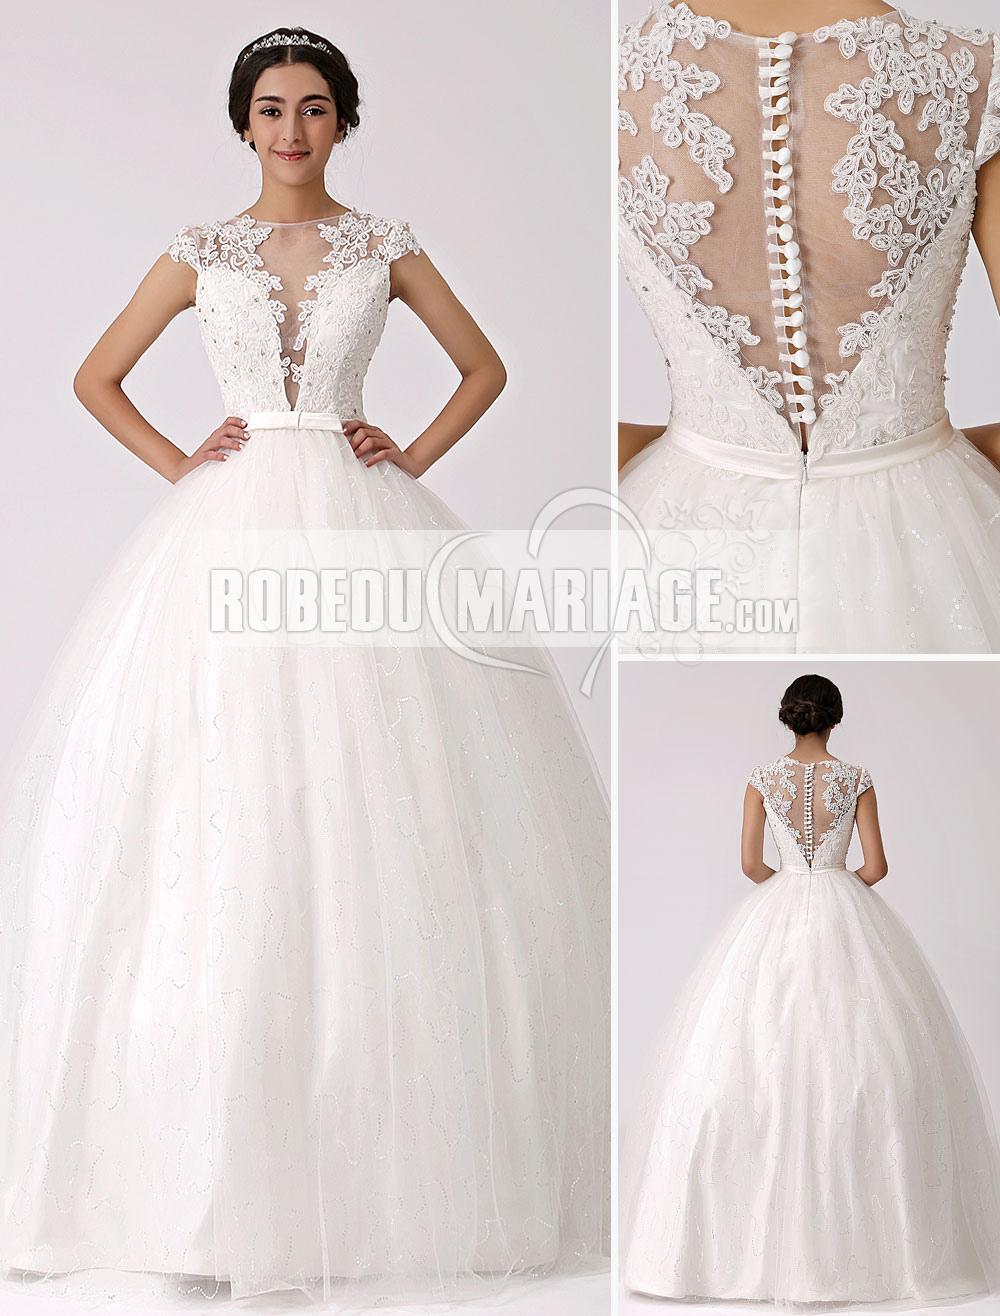 Robes de mariage Nouveauté robe de mariage ample en satin applique